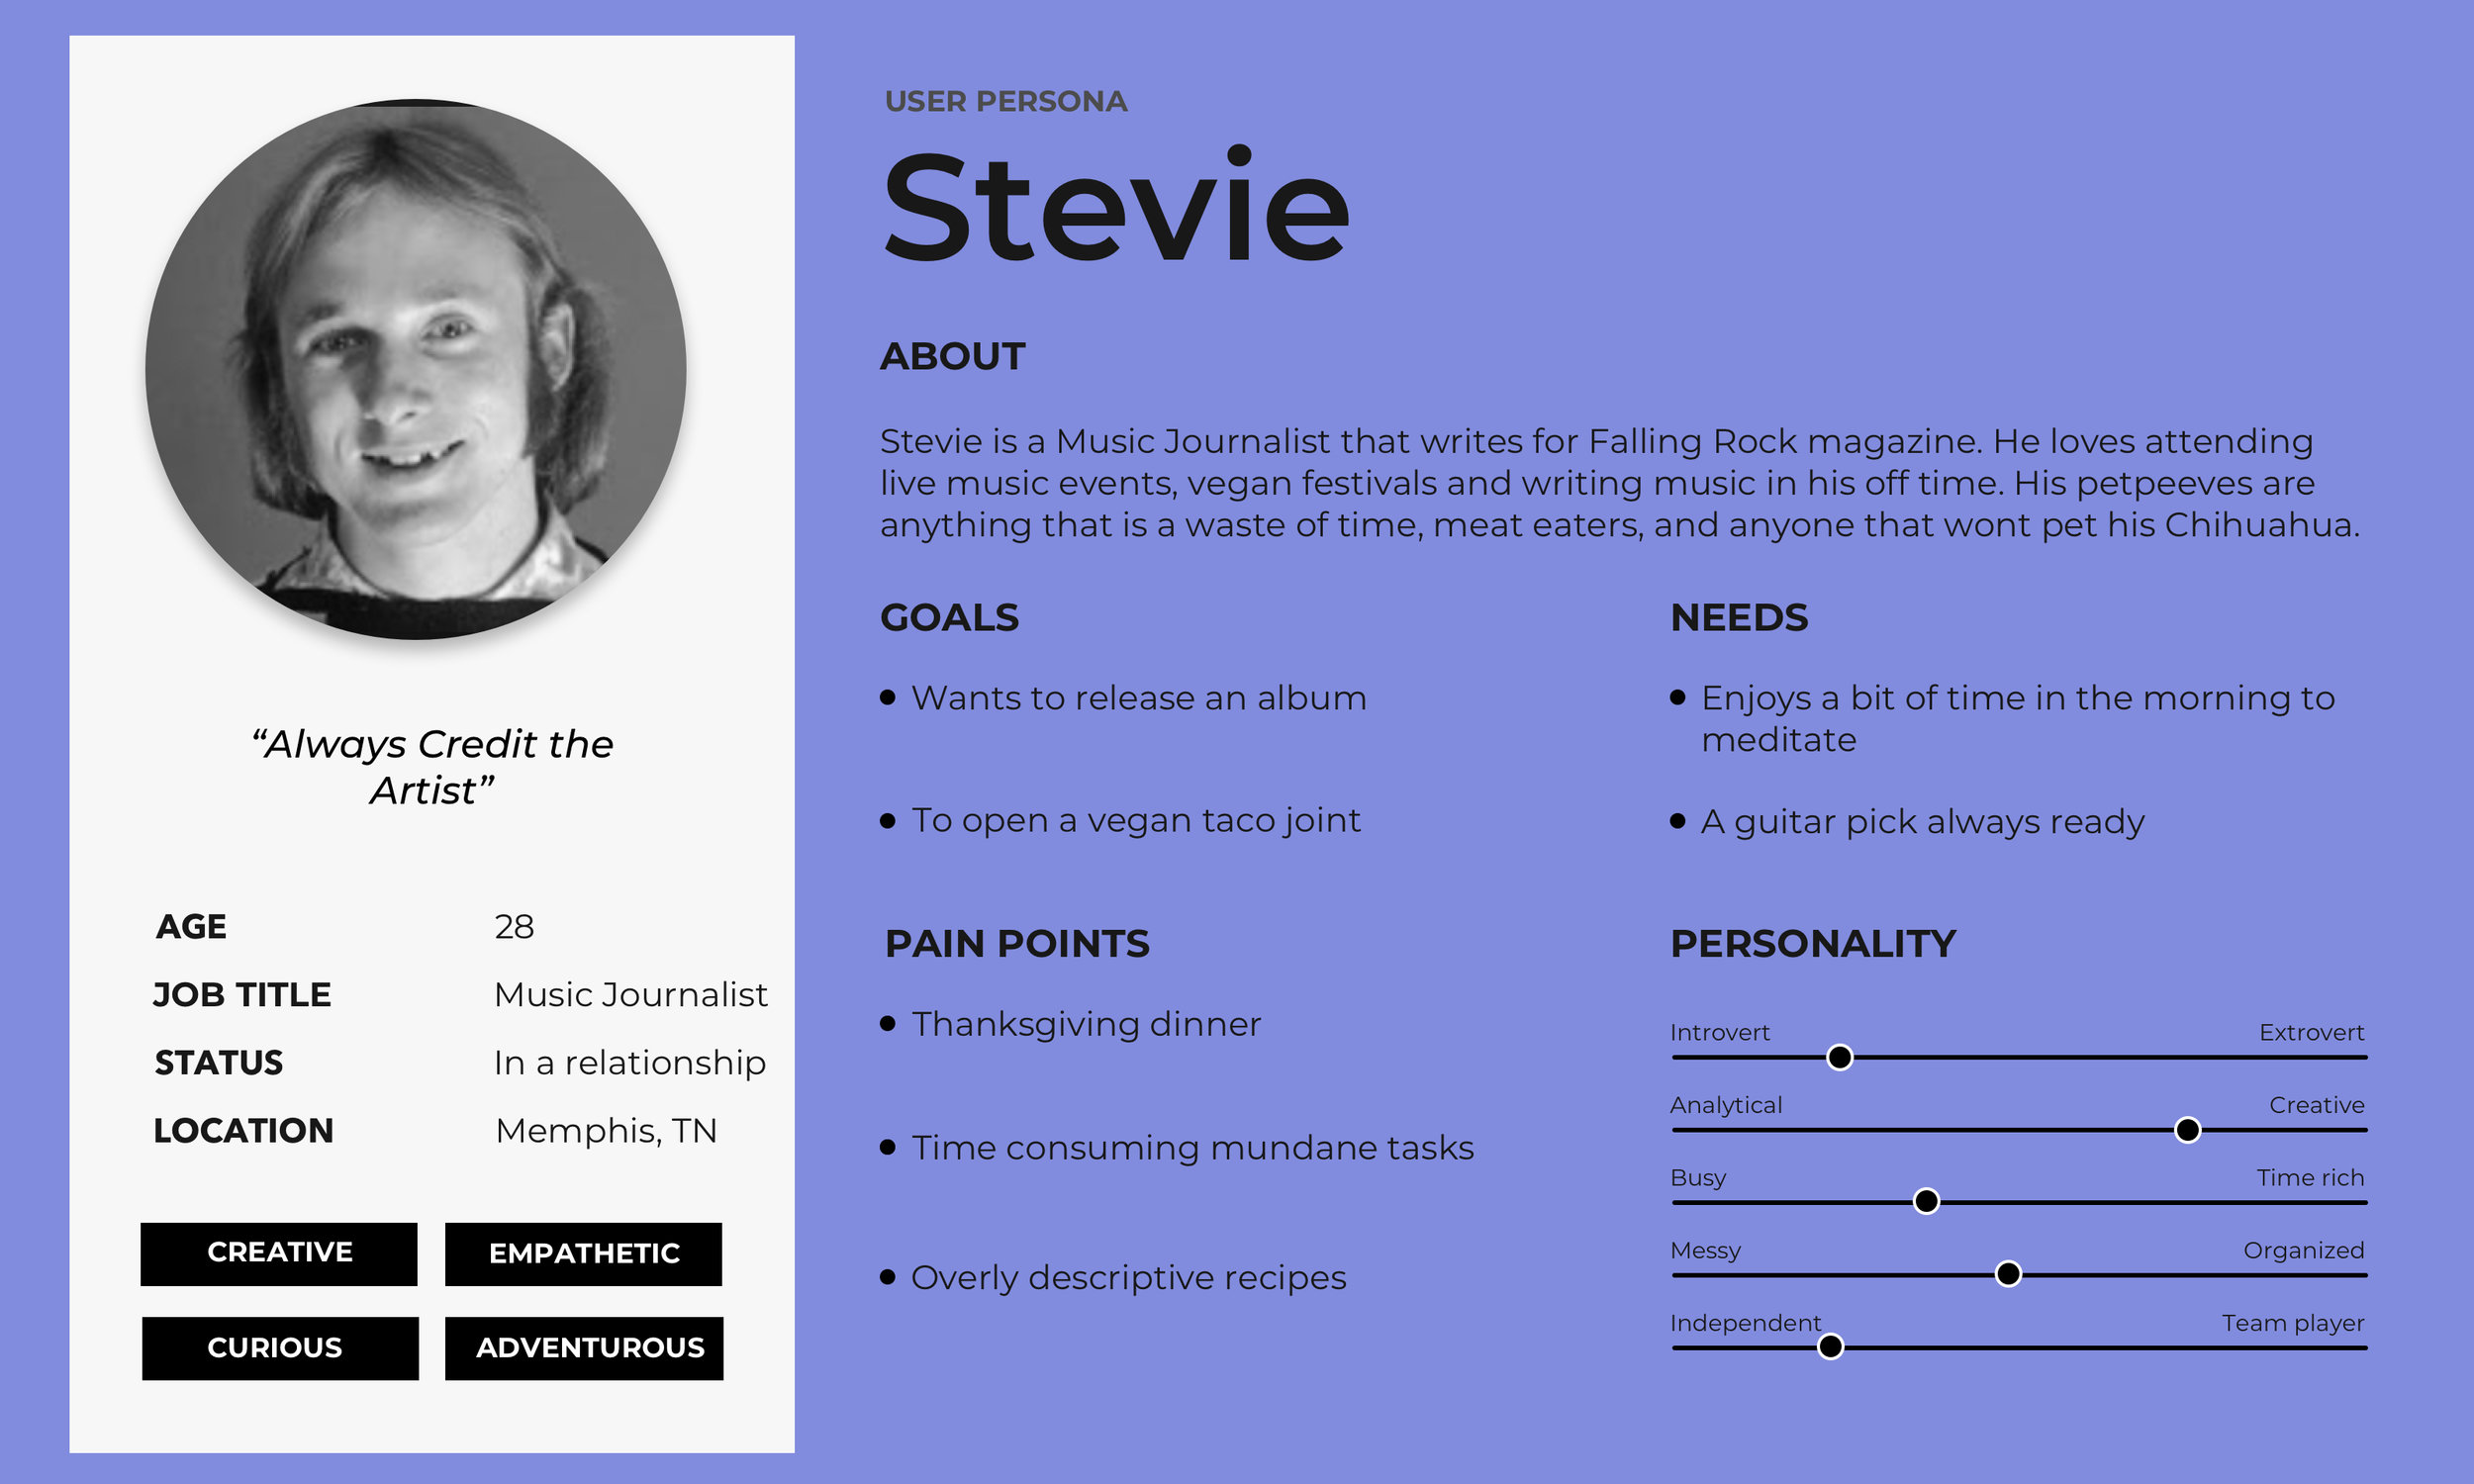 Stevie.persona.jpg